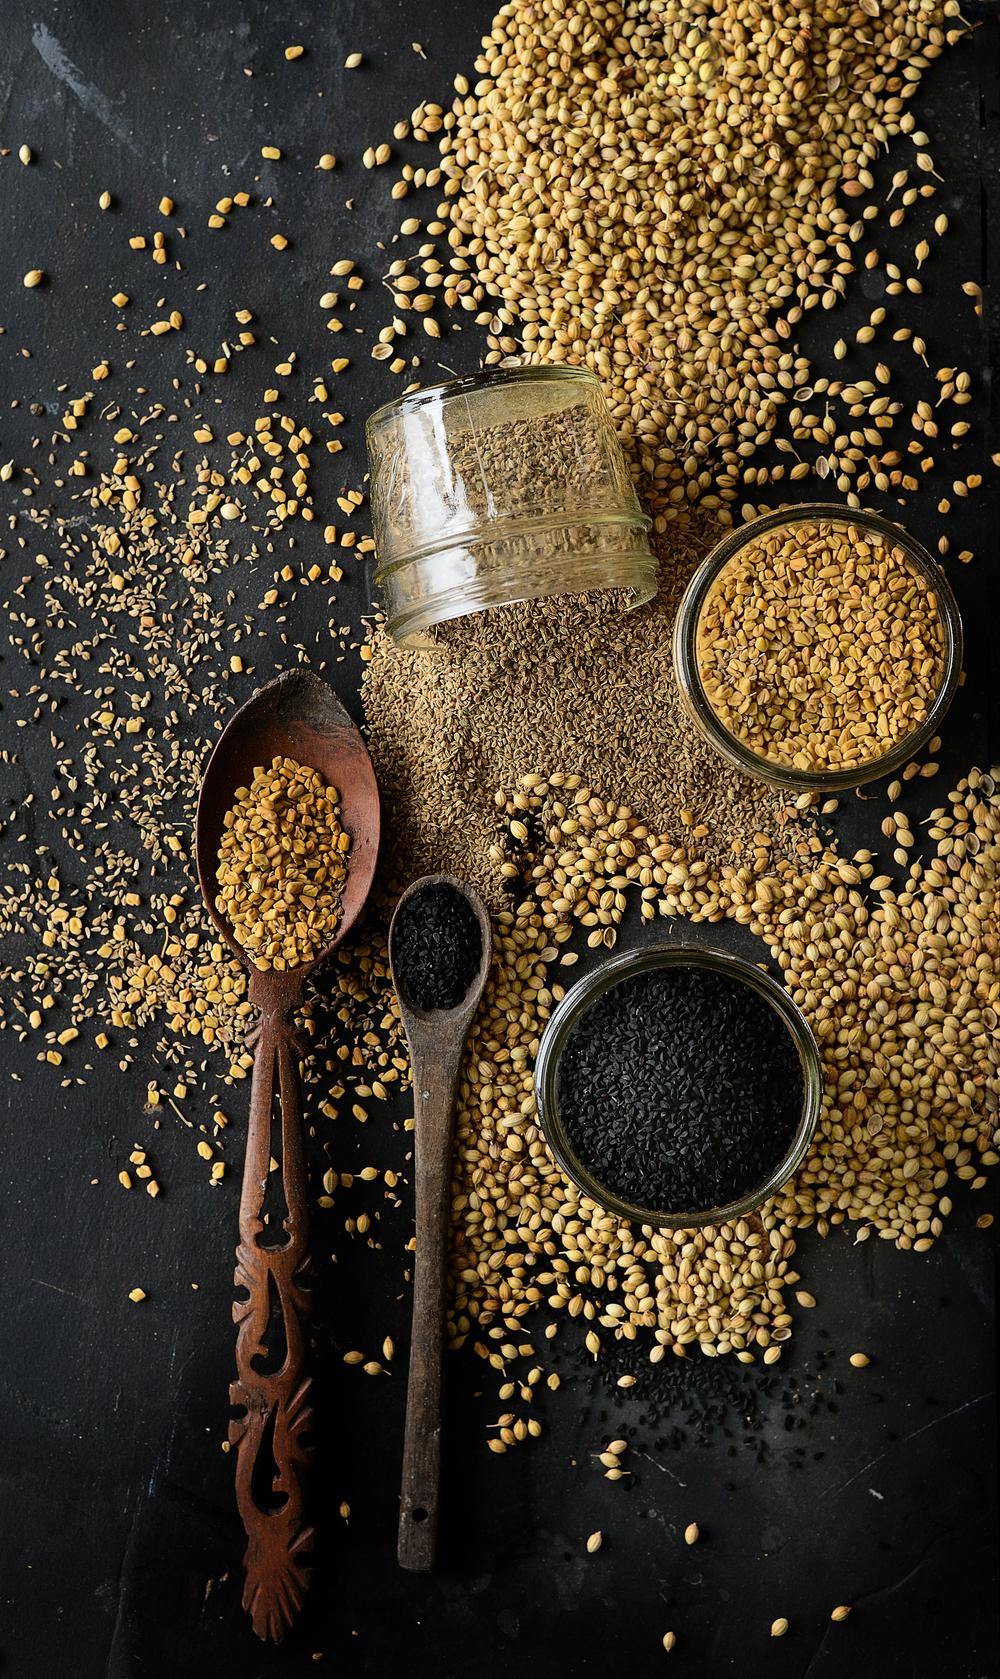 Spices3-HR-SimiJois-2016_edited-1.jpg